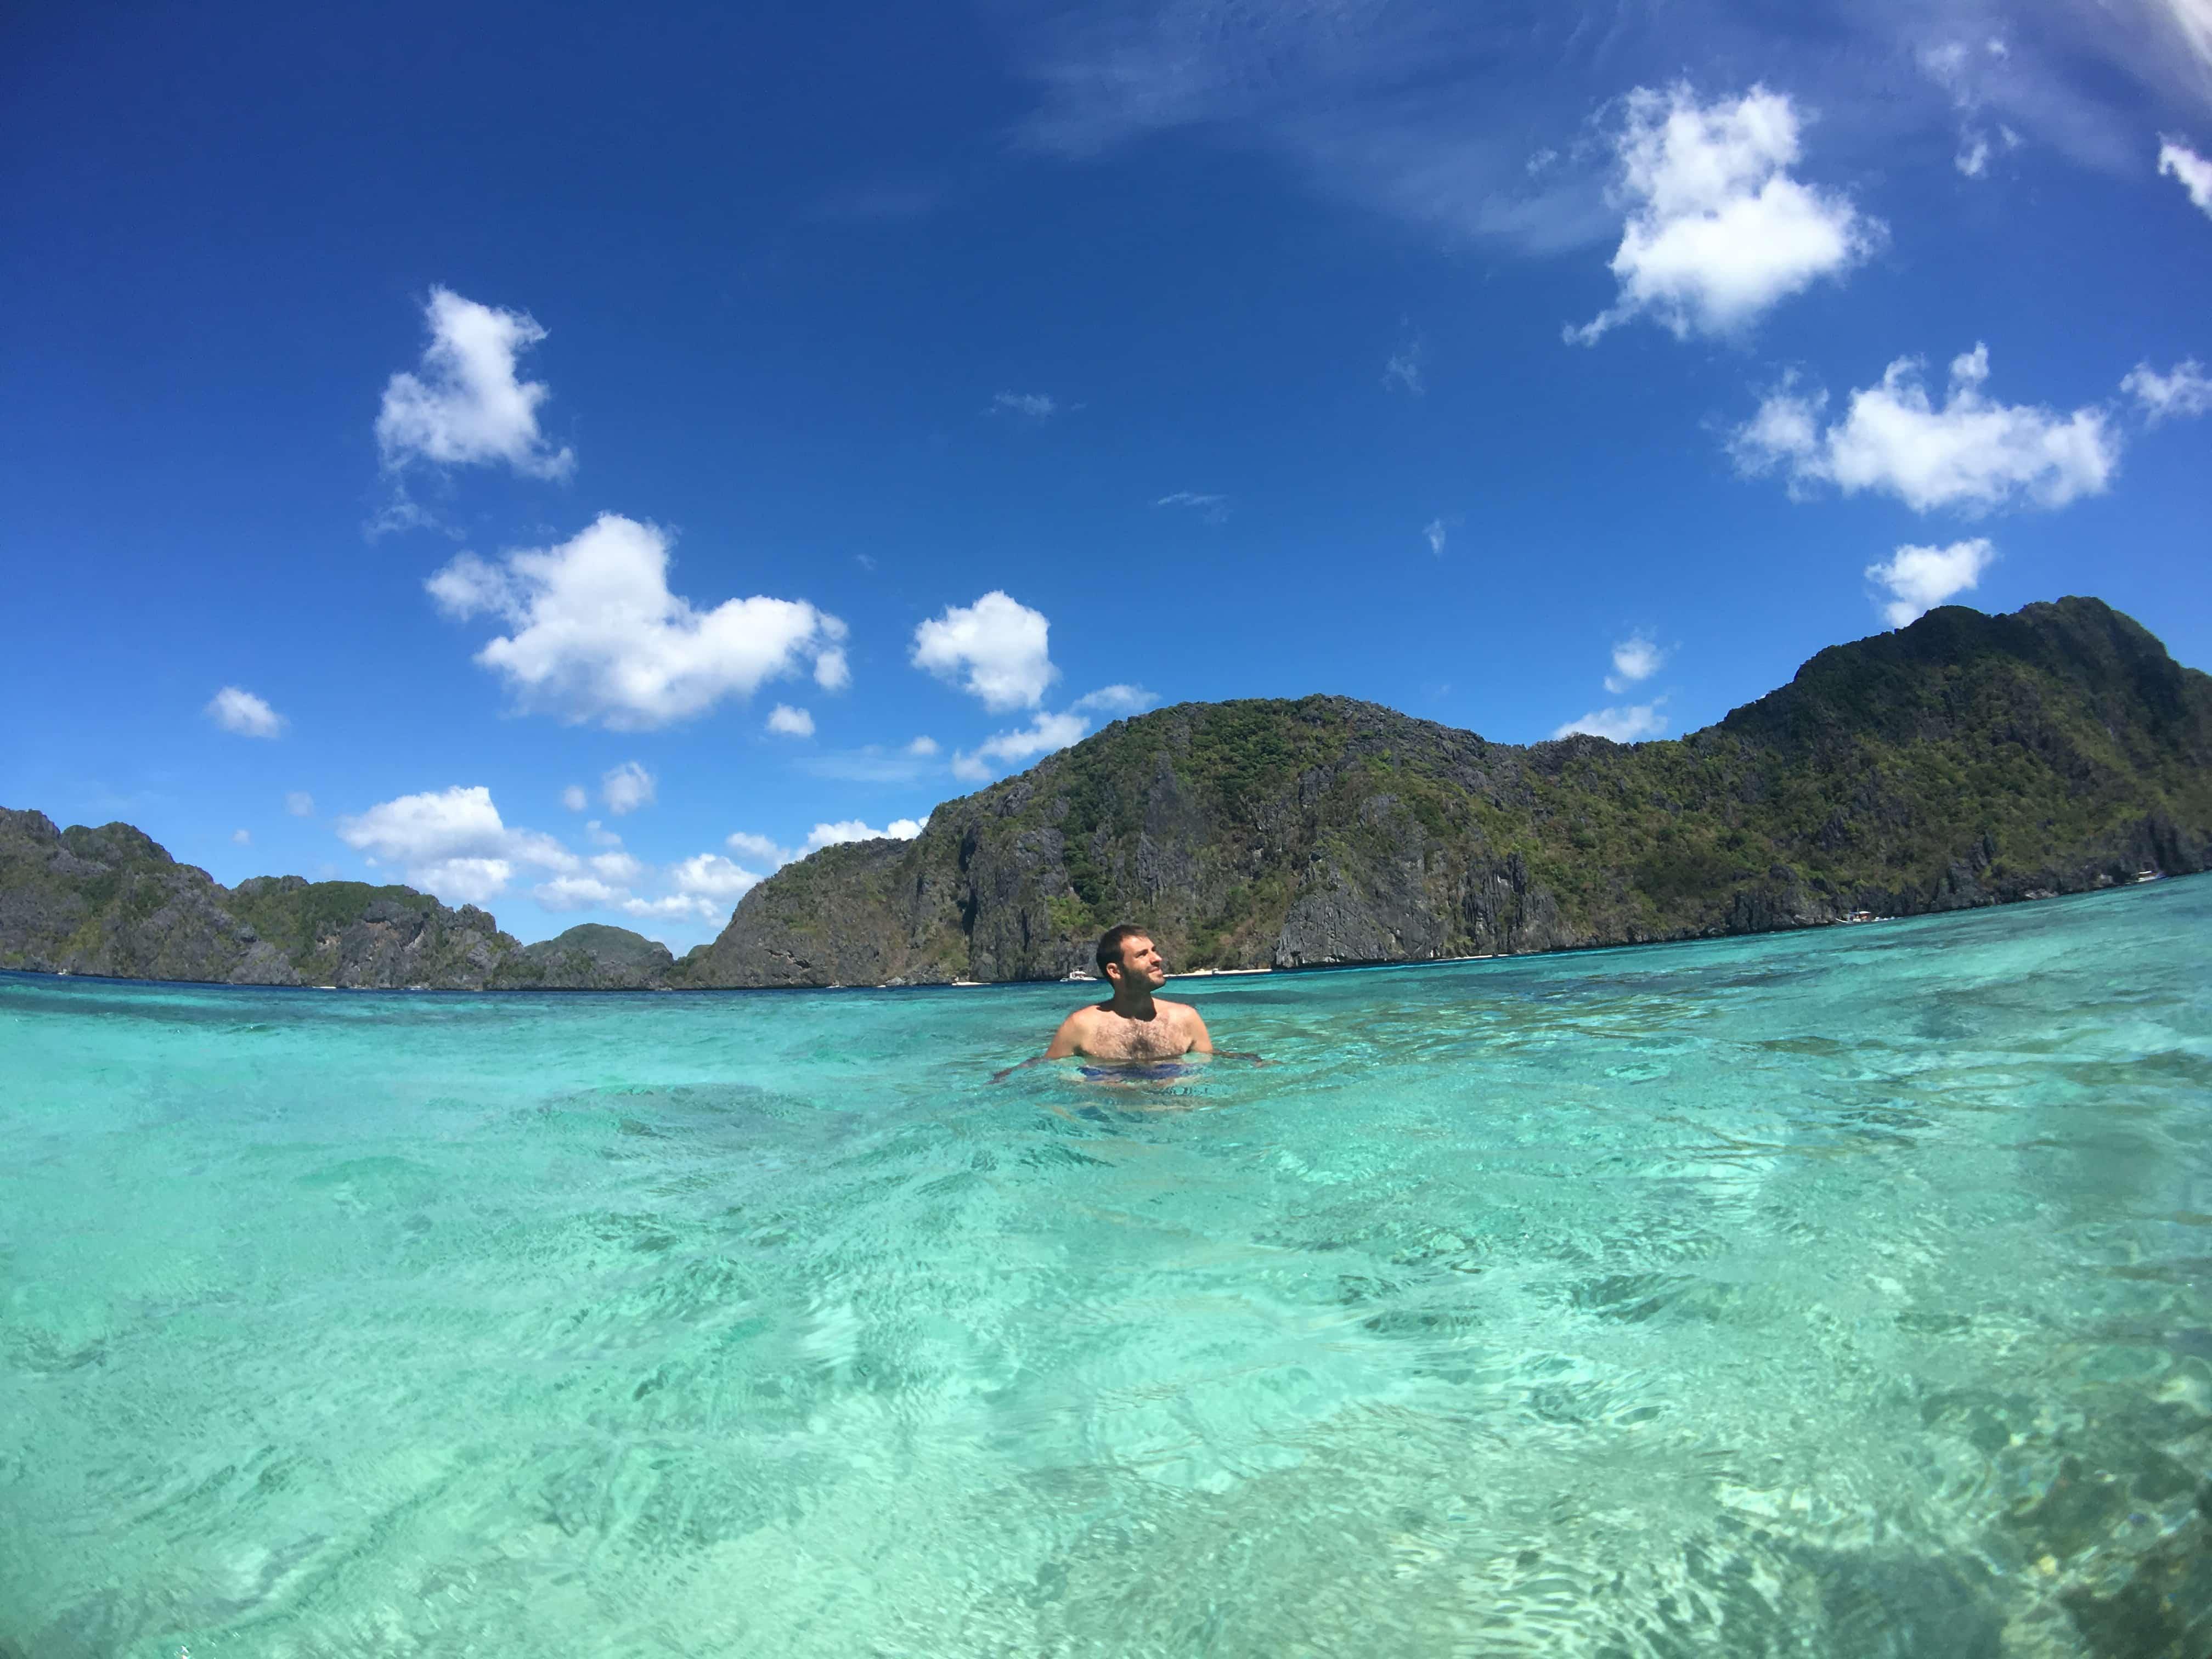 Palawan tourist spots, El Nido